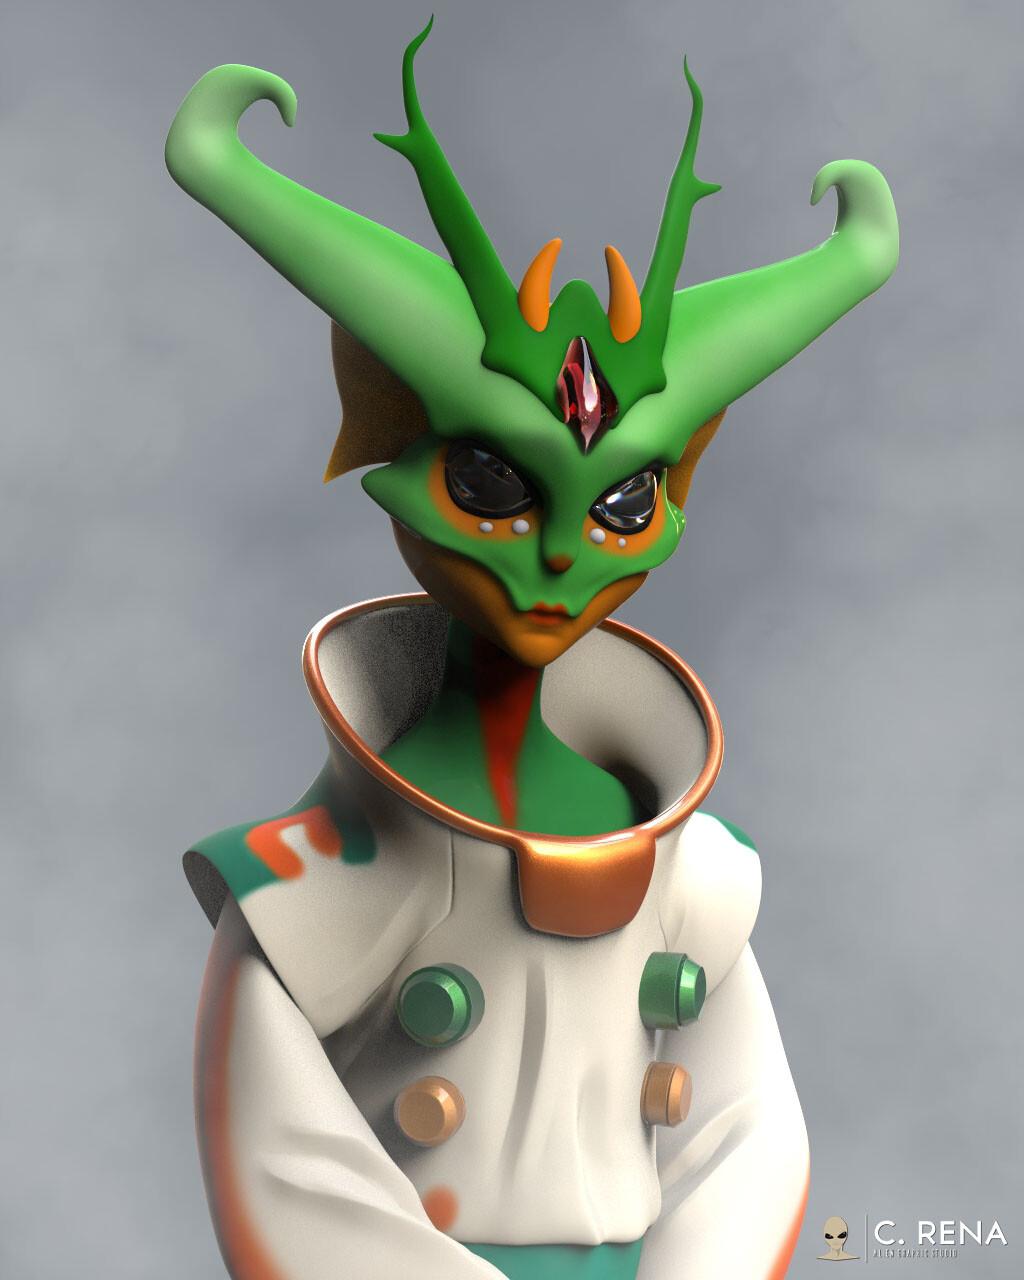 The Alien Creature Astronaut